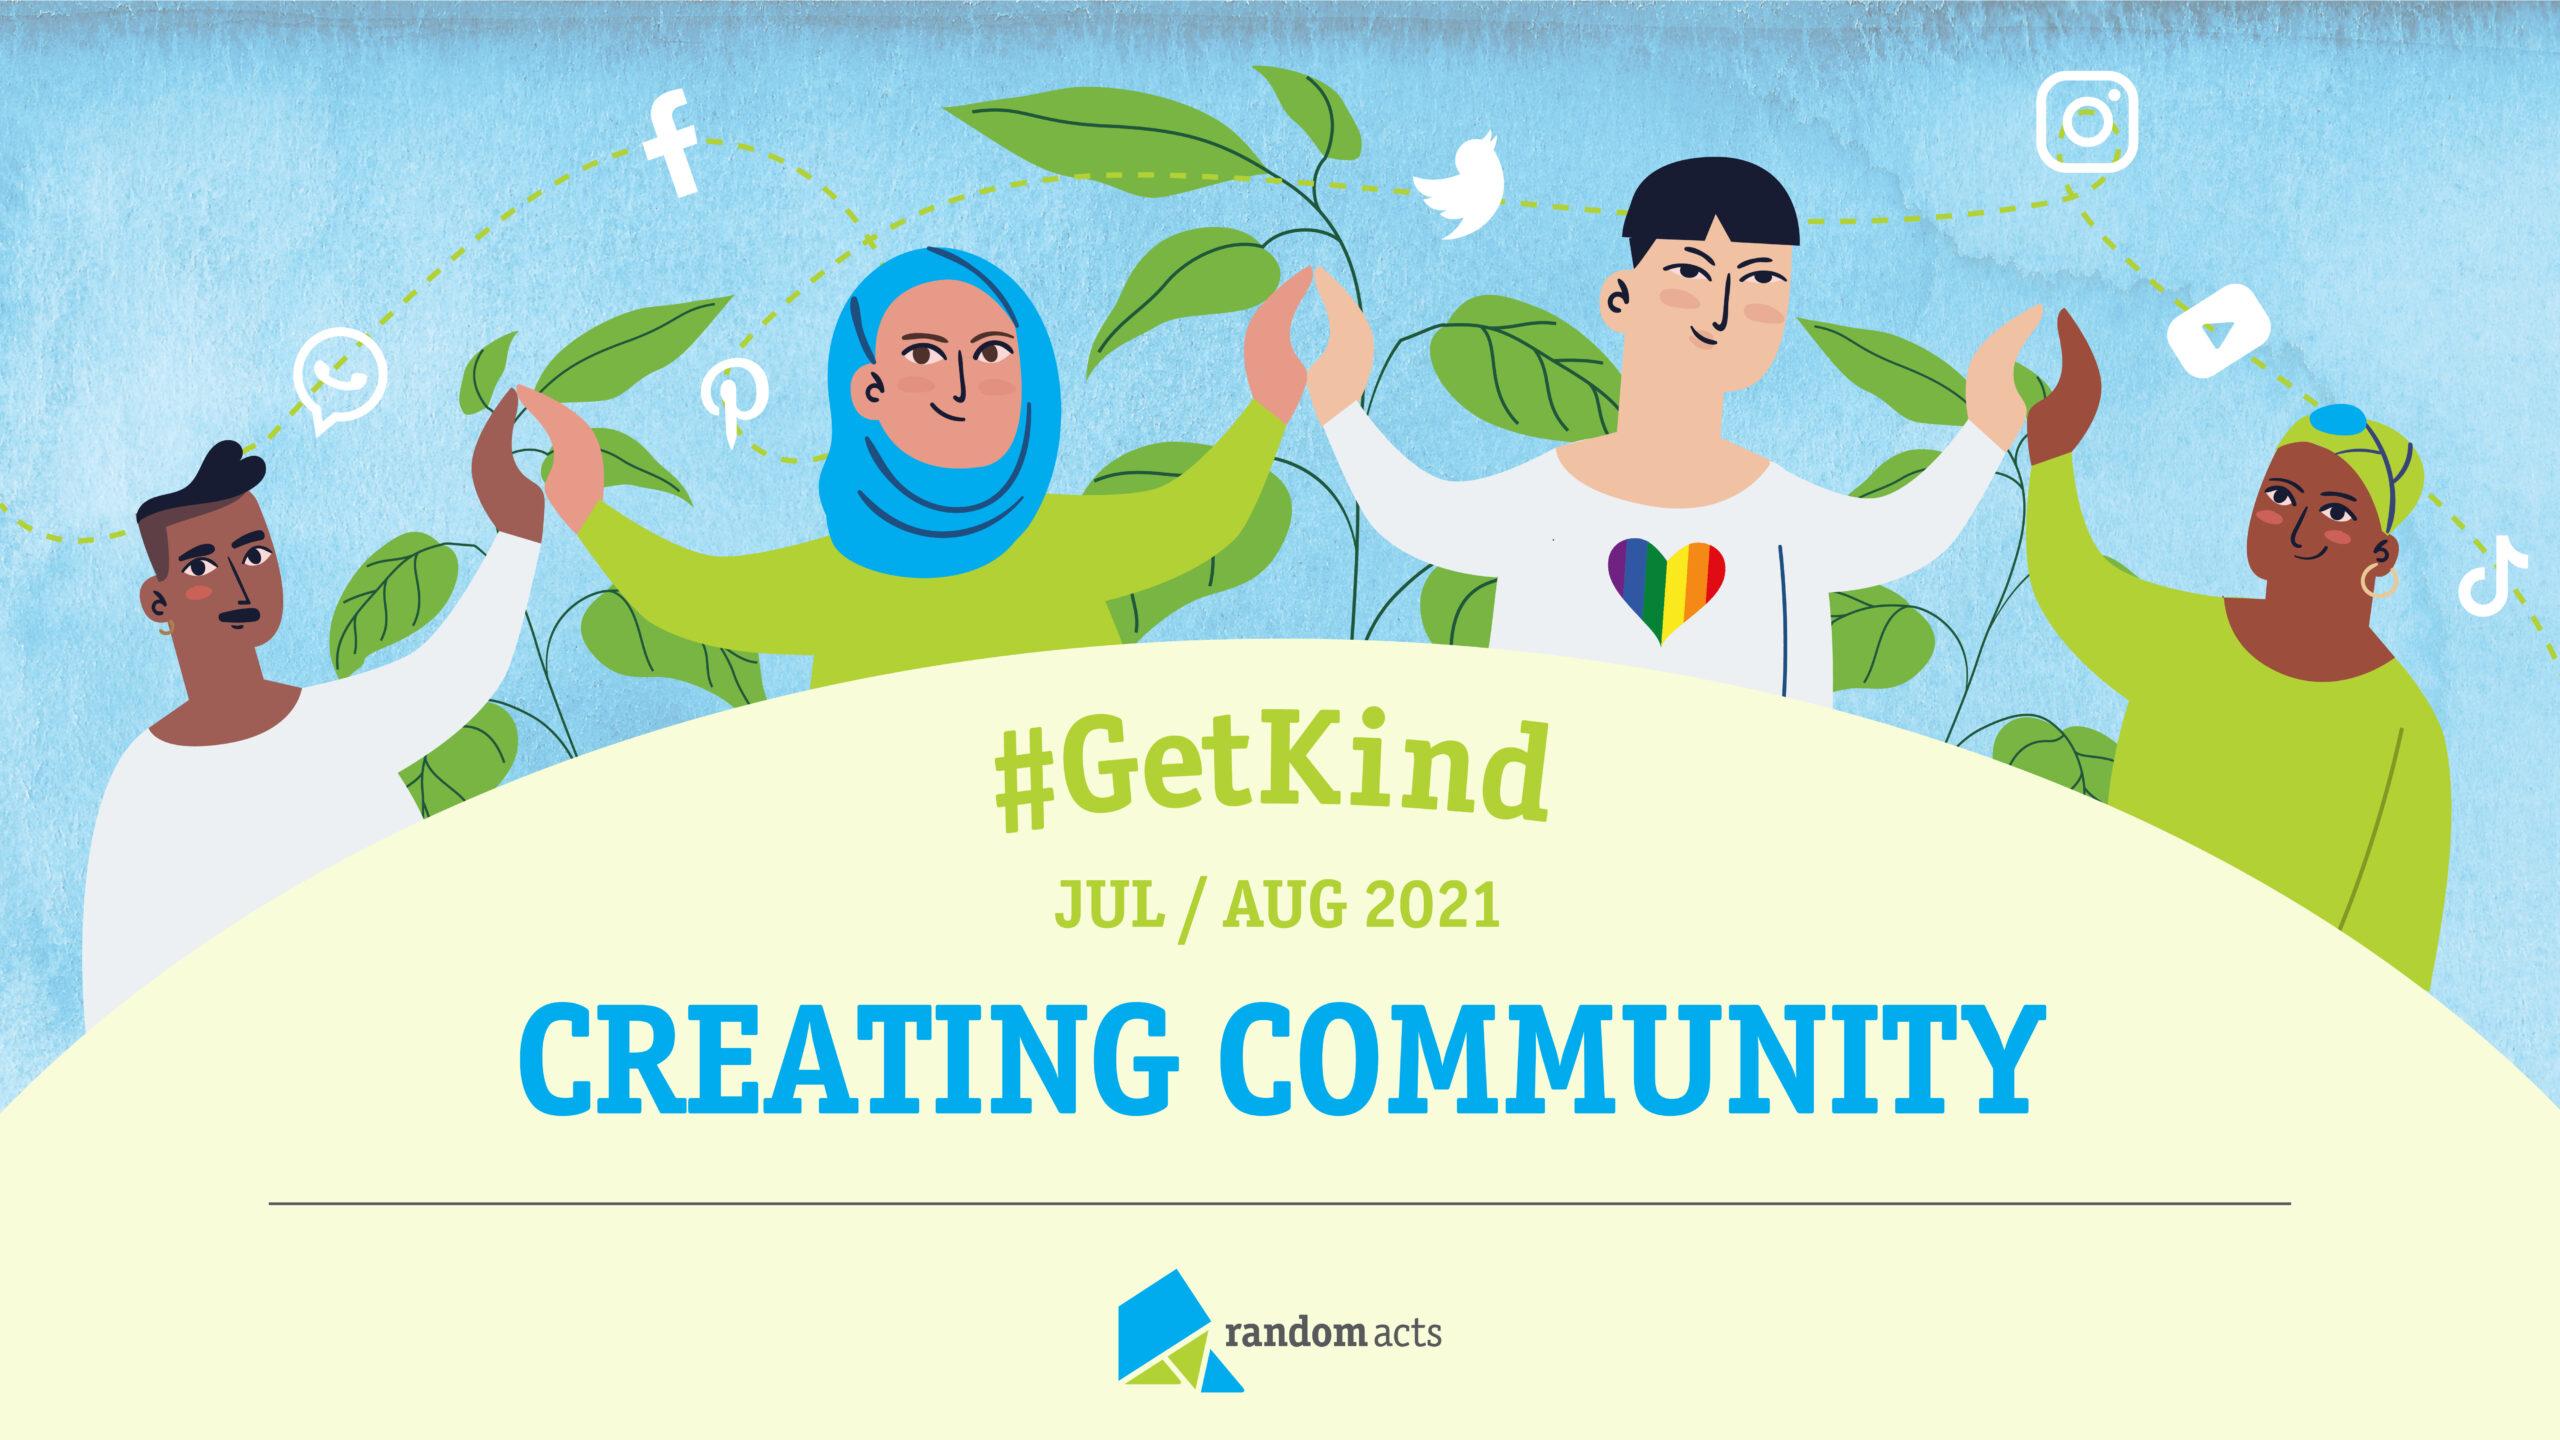 #GetKind — Creating Community